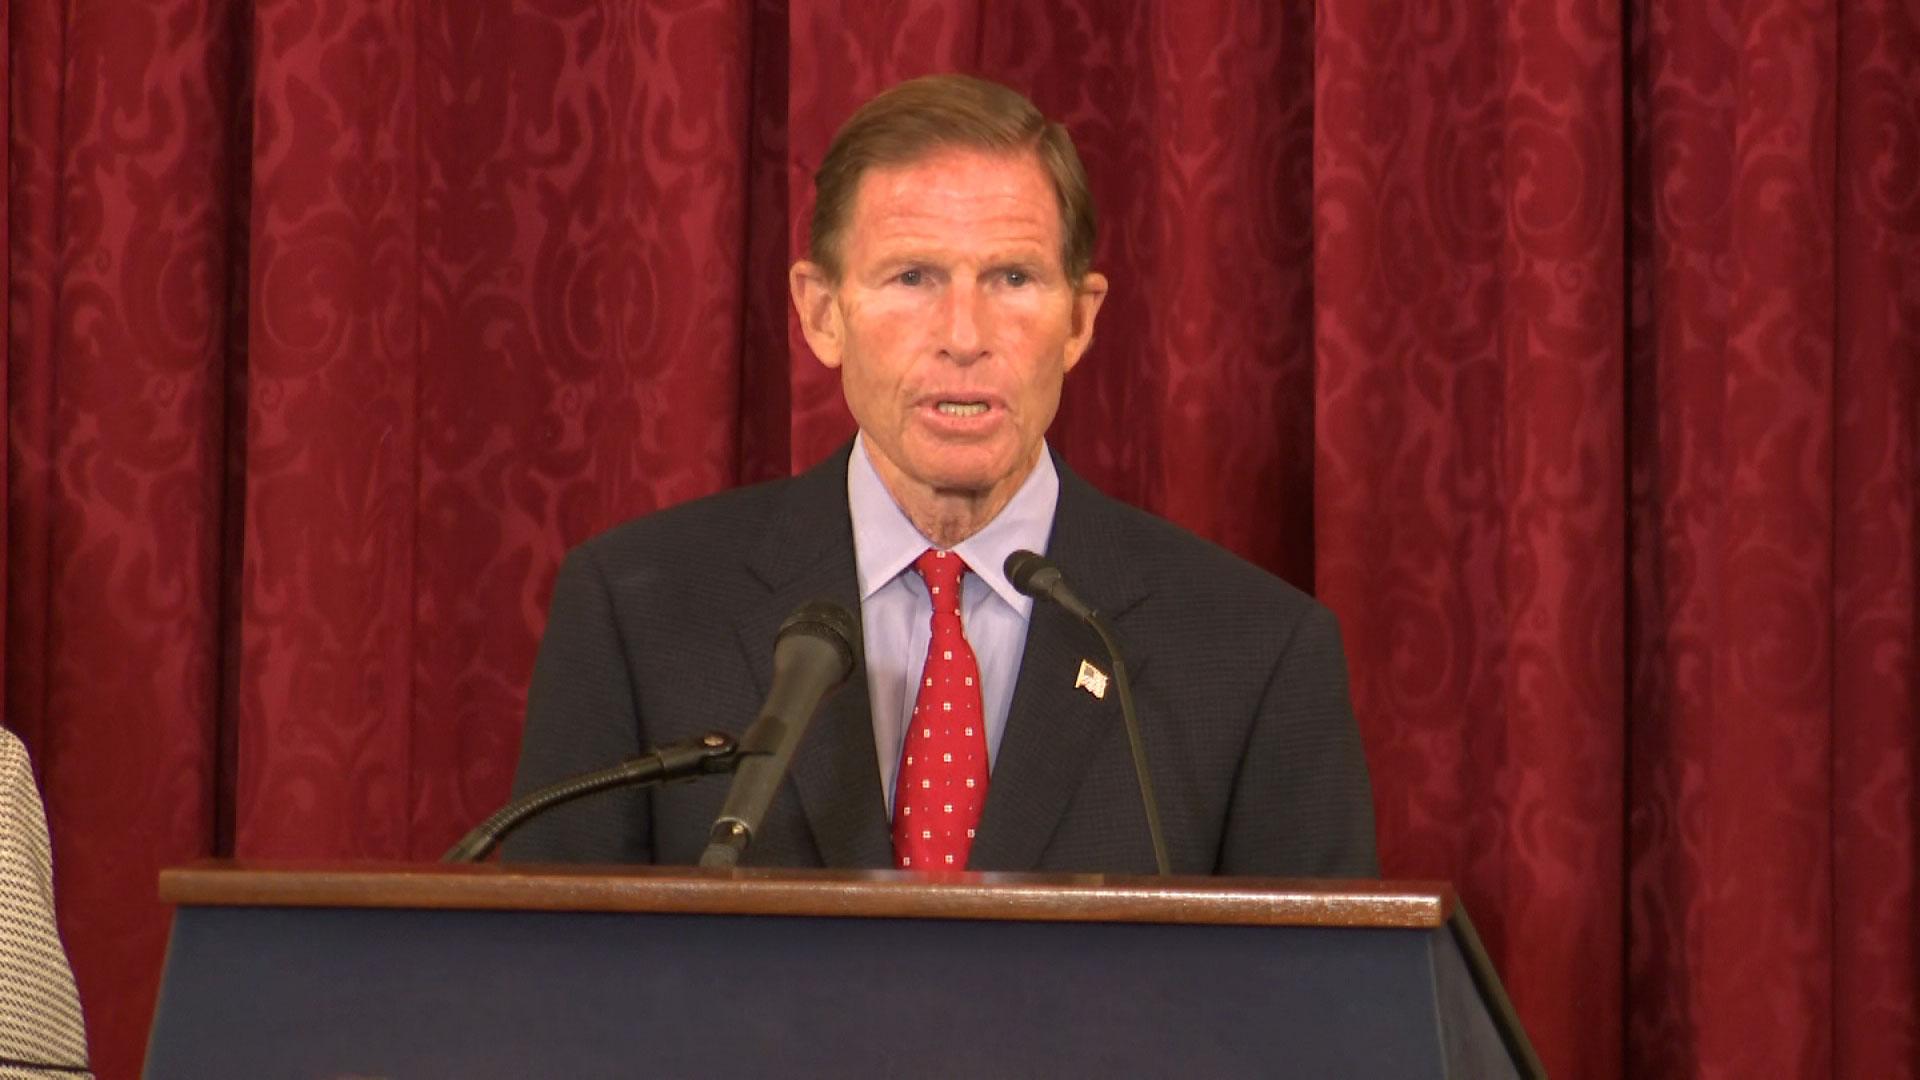 Sen. Richard Blumenthal speaks at a press conference in Washington, DC, on September 15.